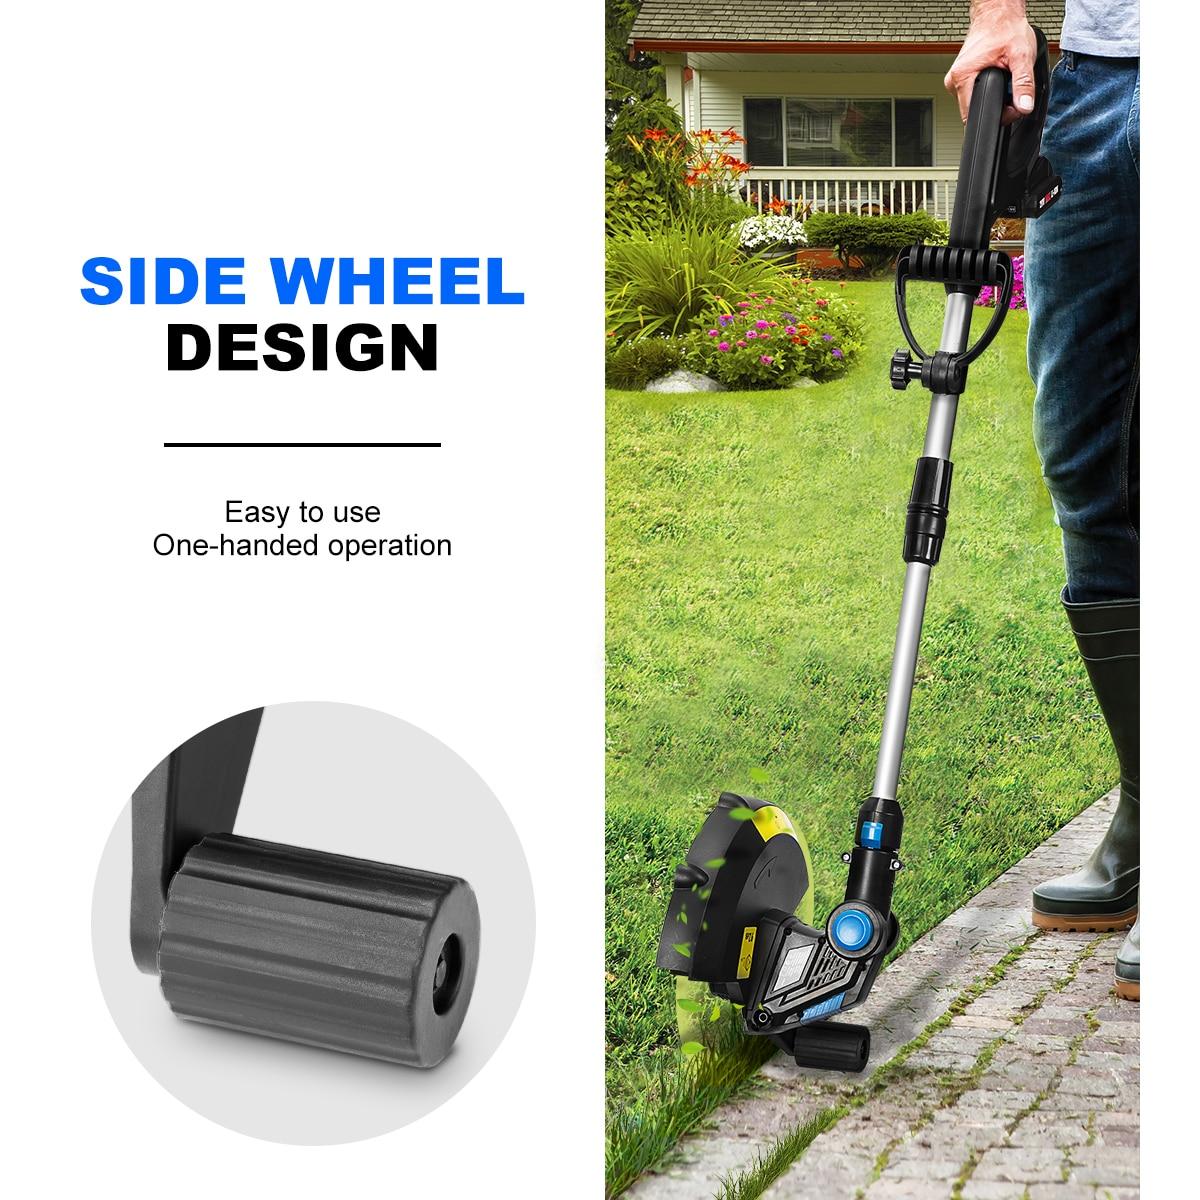 Side Wheel Design